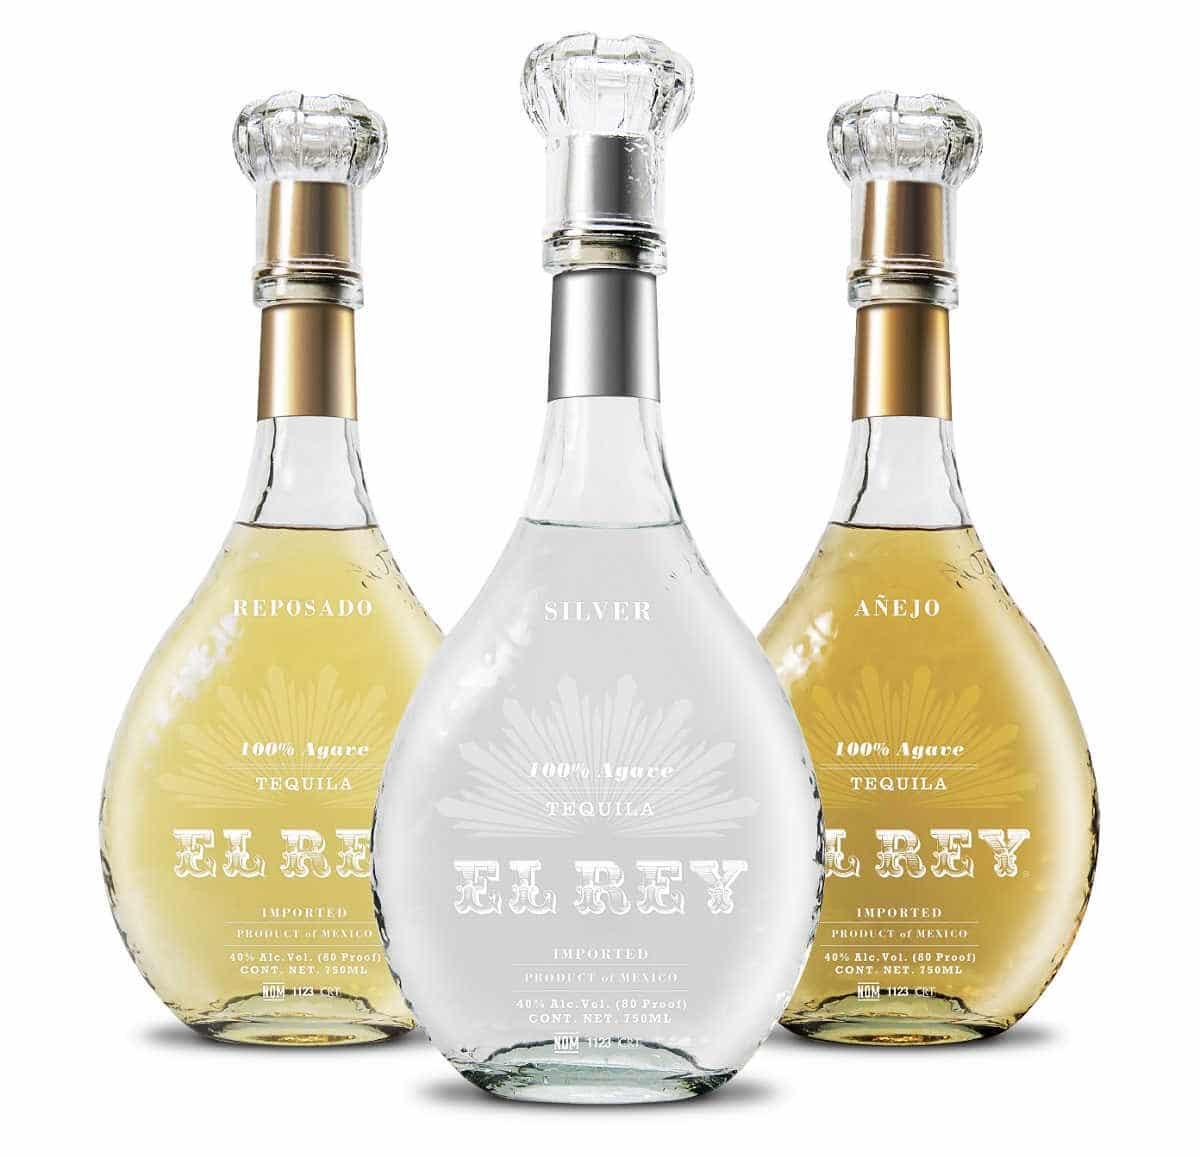 three bottles of tequila el rey tequila